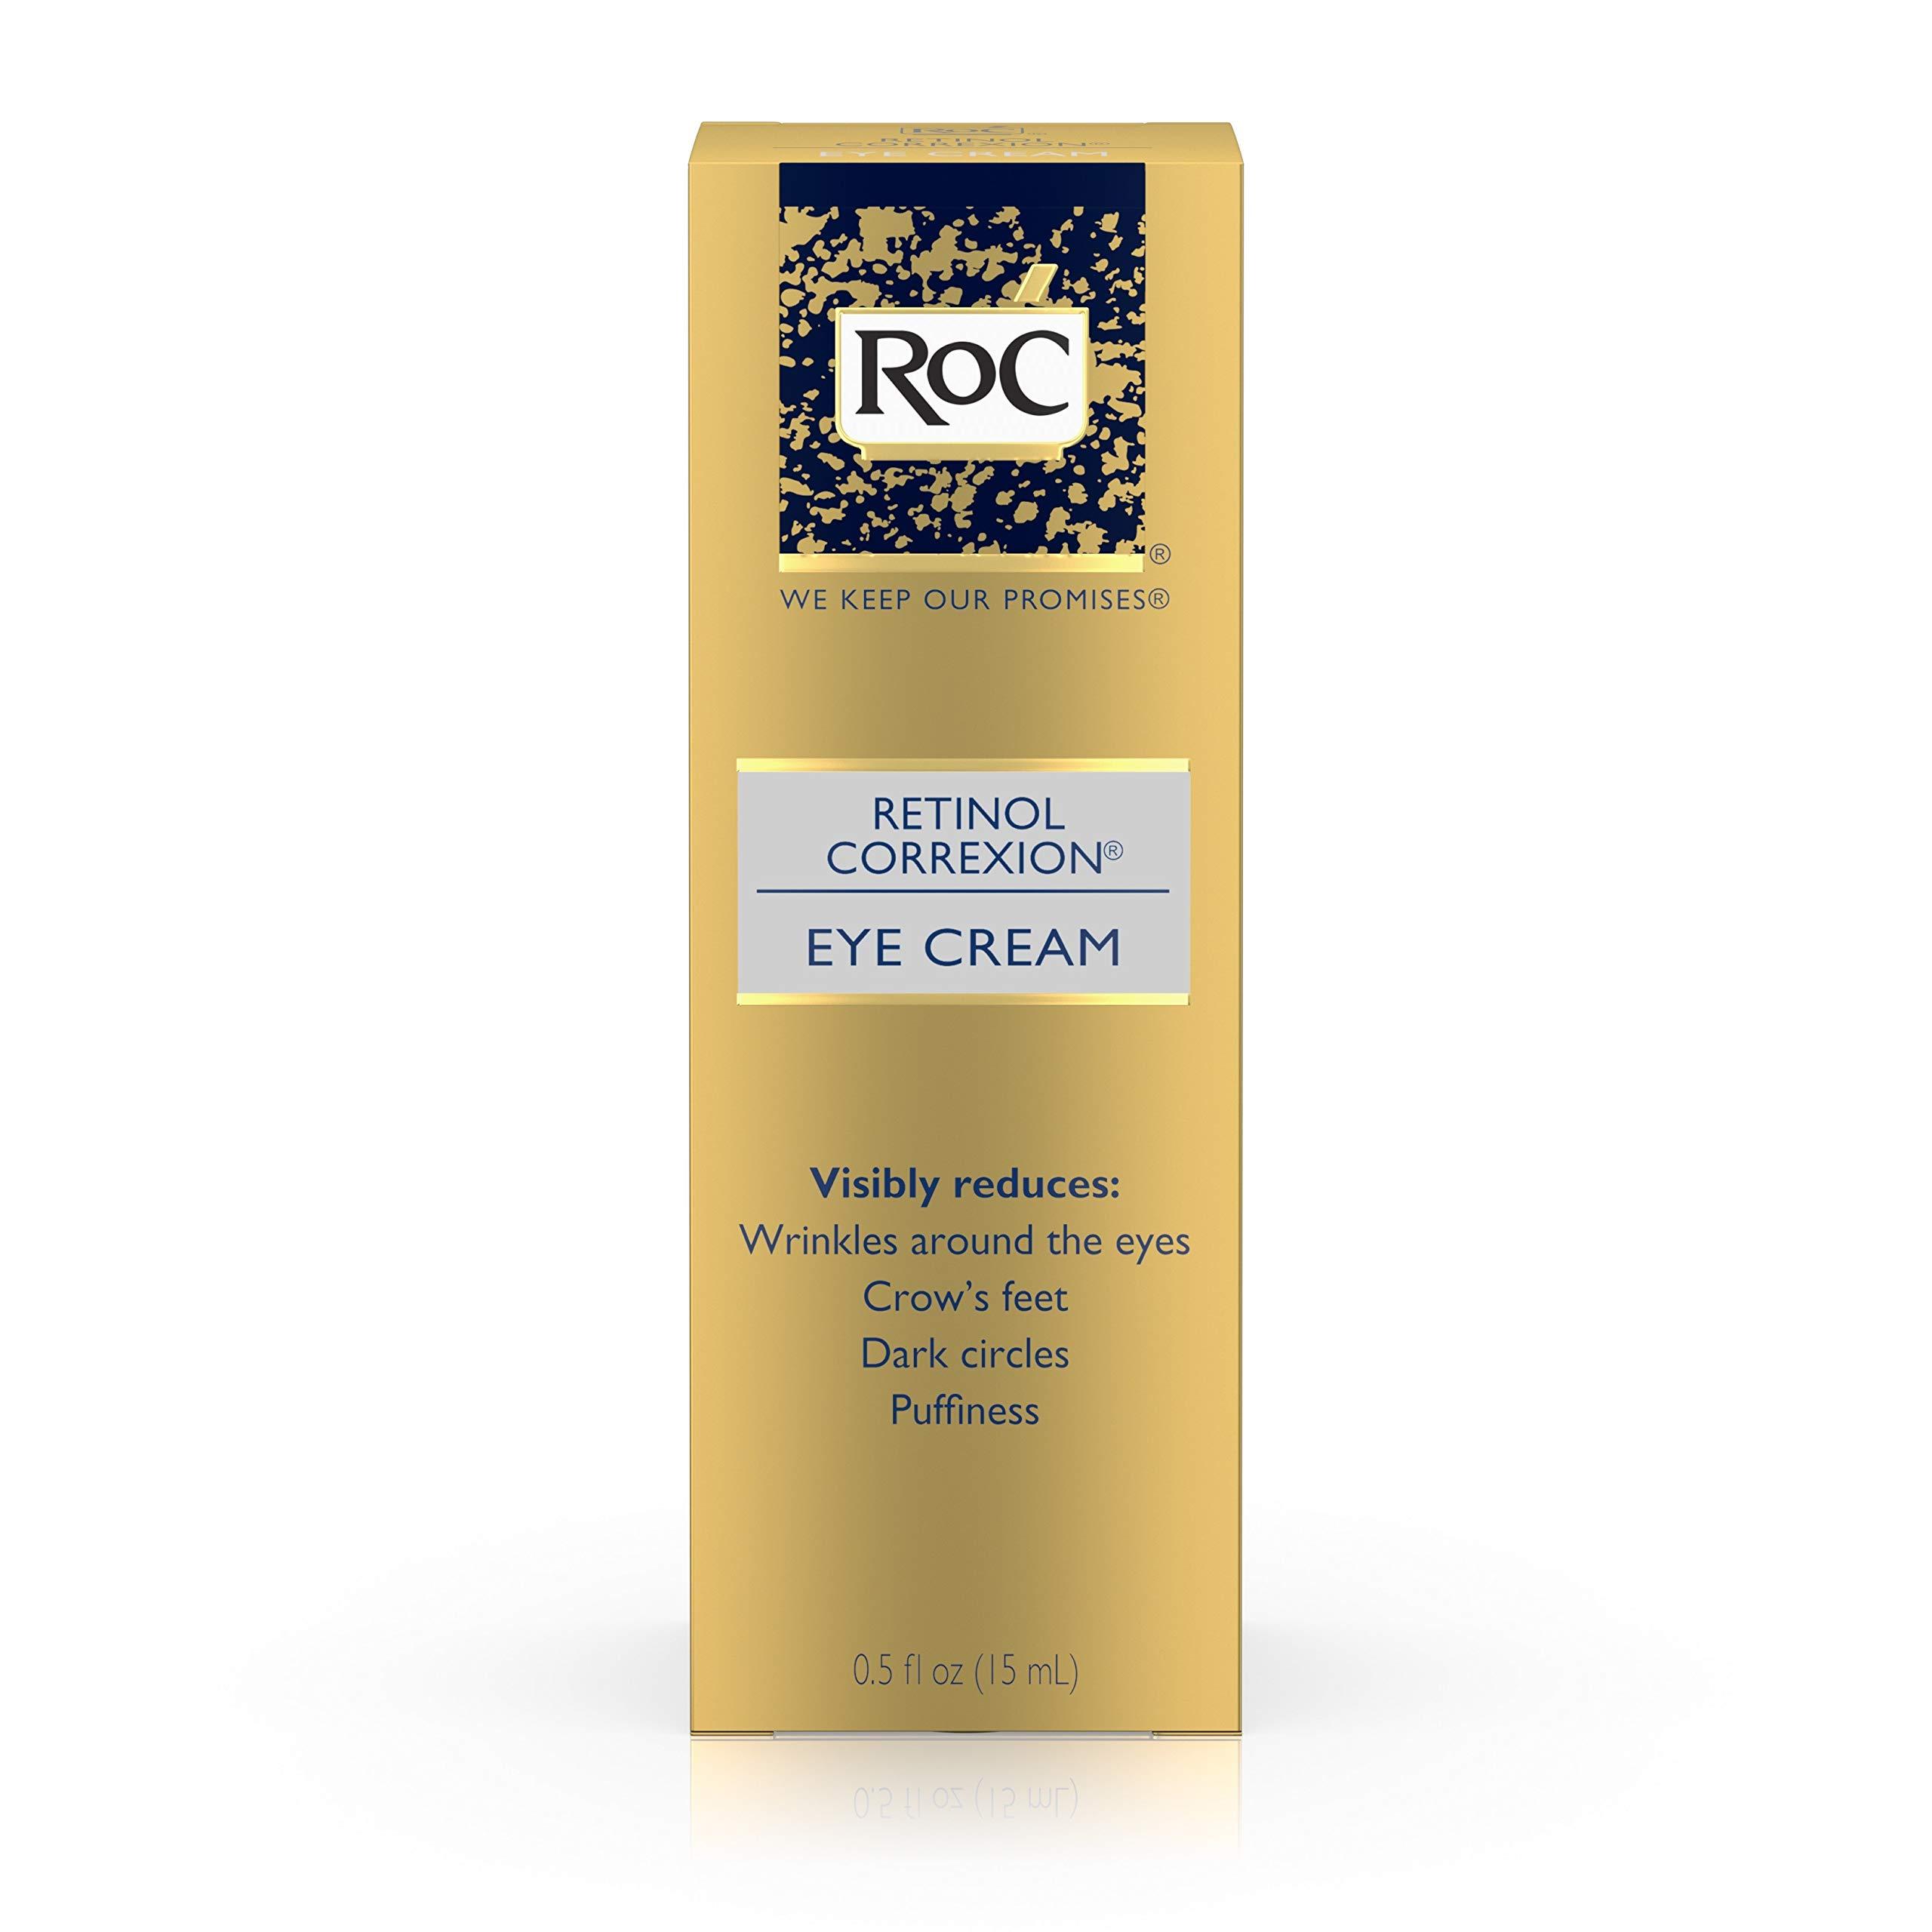 RoC Retinol Correxion Anti-Aging Eye Cream Treatment for Wrinkles, Crows Feet, Dark Circles, and Puffiness.5 fl. oz by RoC